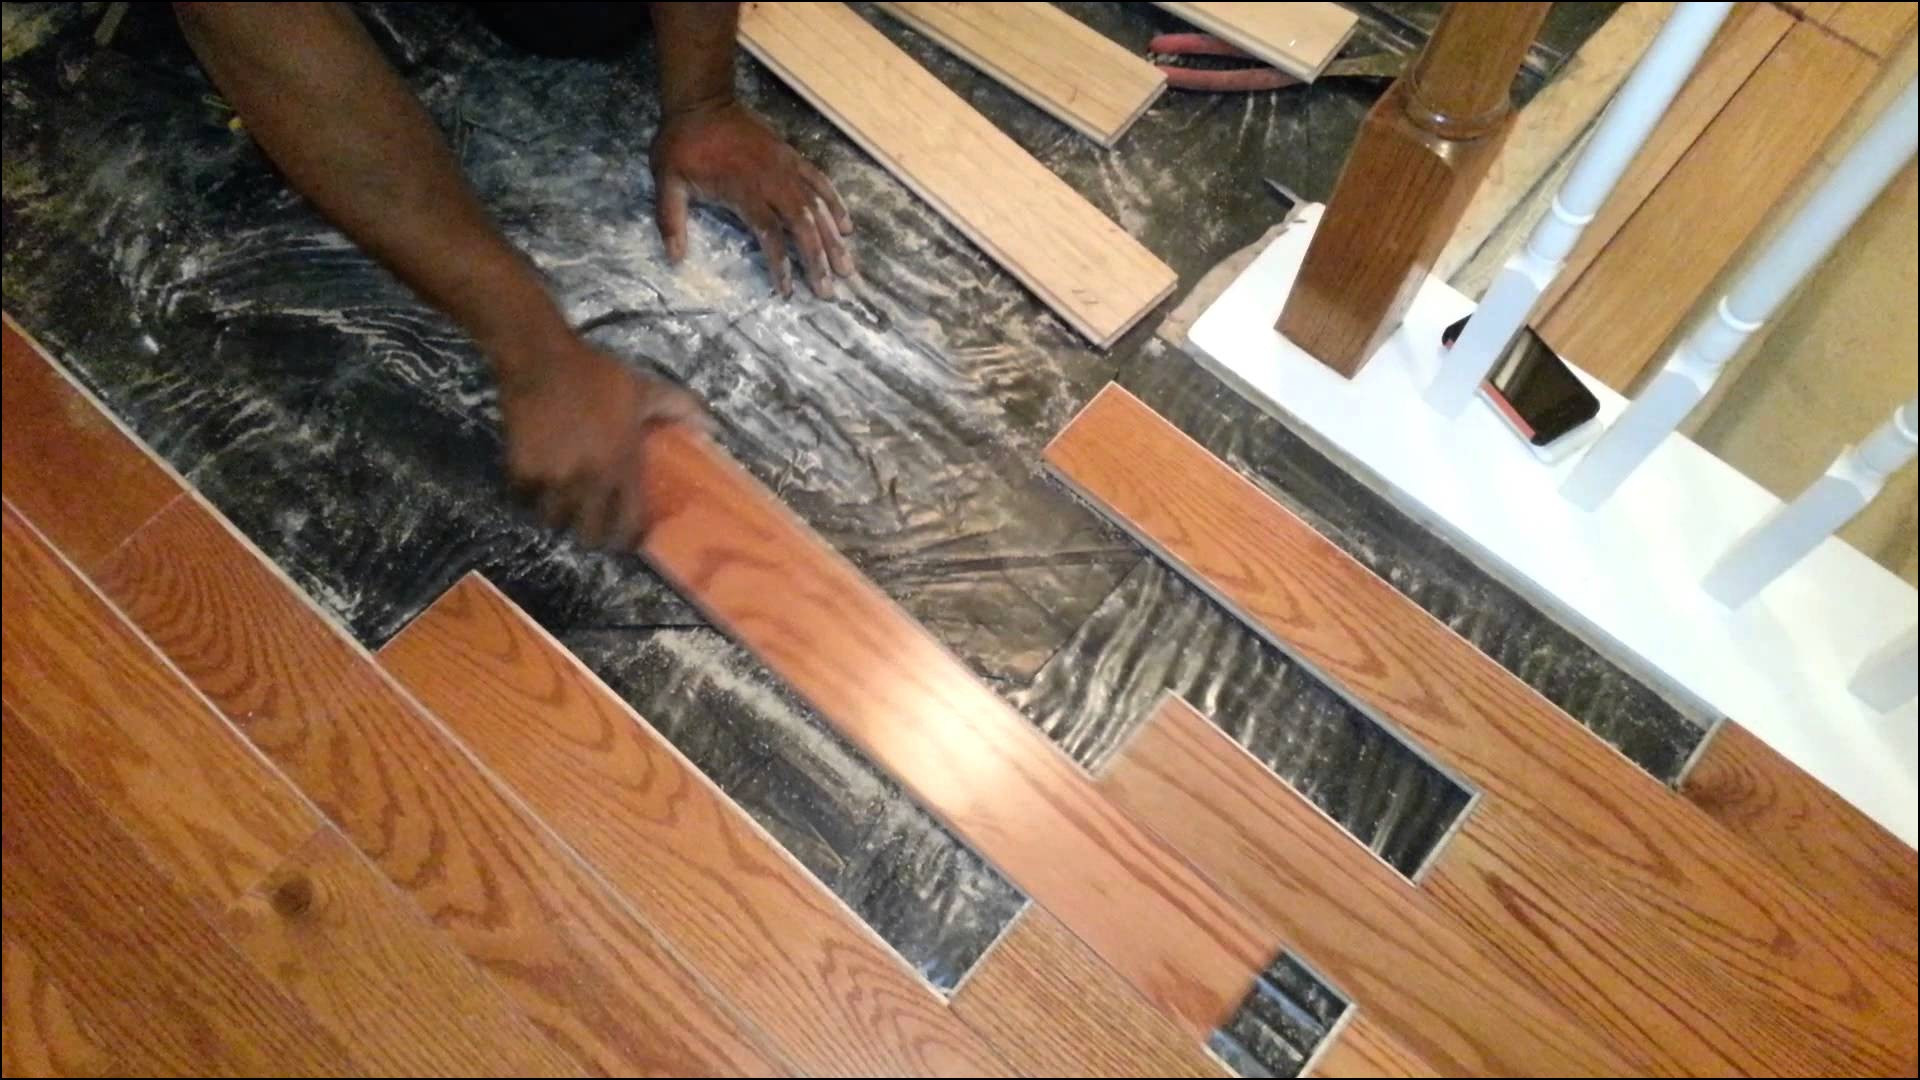 hardwood floor installation cost toronto of hardwood flooring suppliers france flooring ideas with regard to hardwood flooring cost for 1000 square feet collection hardwood floor installation how to do wood flooring